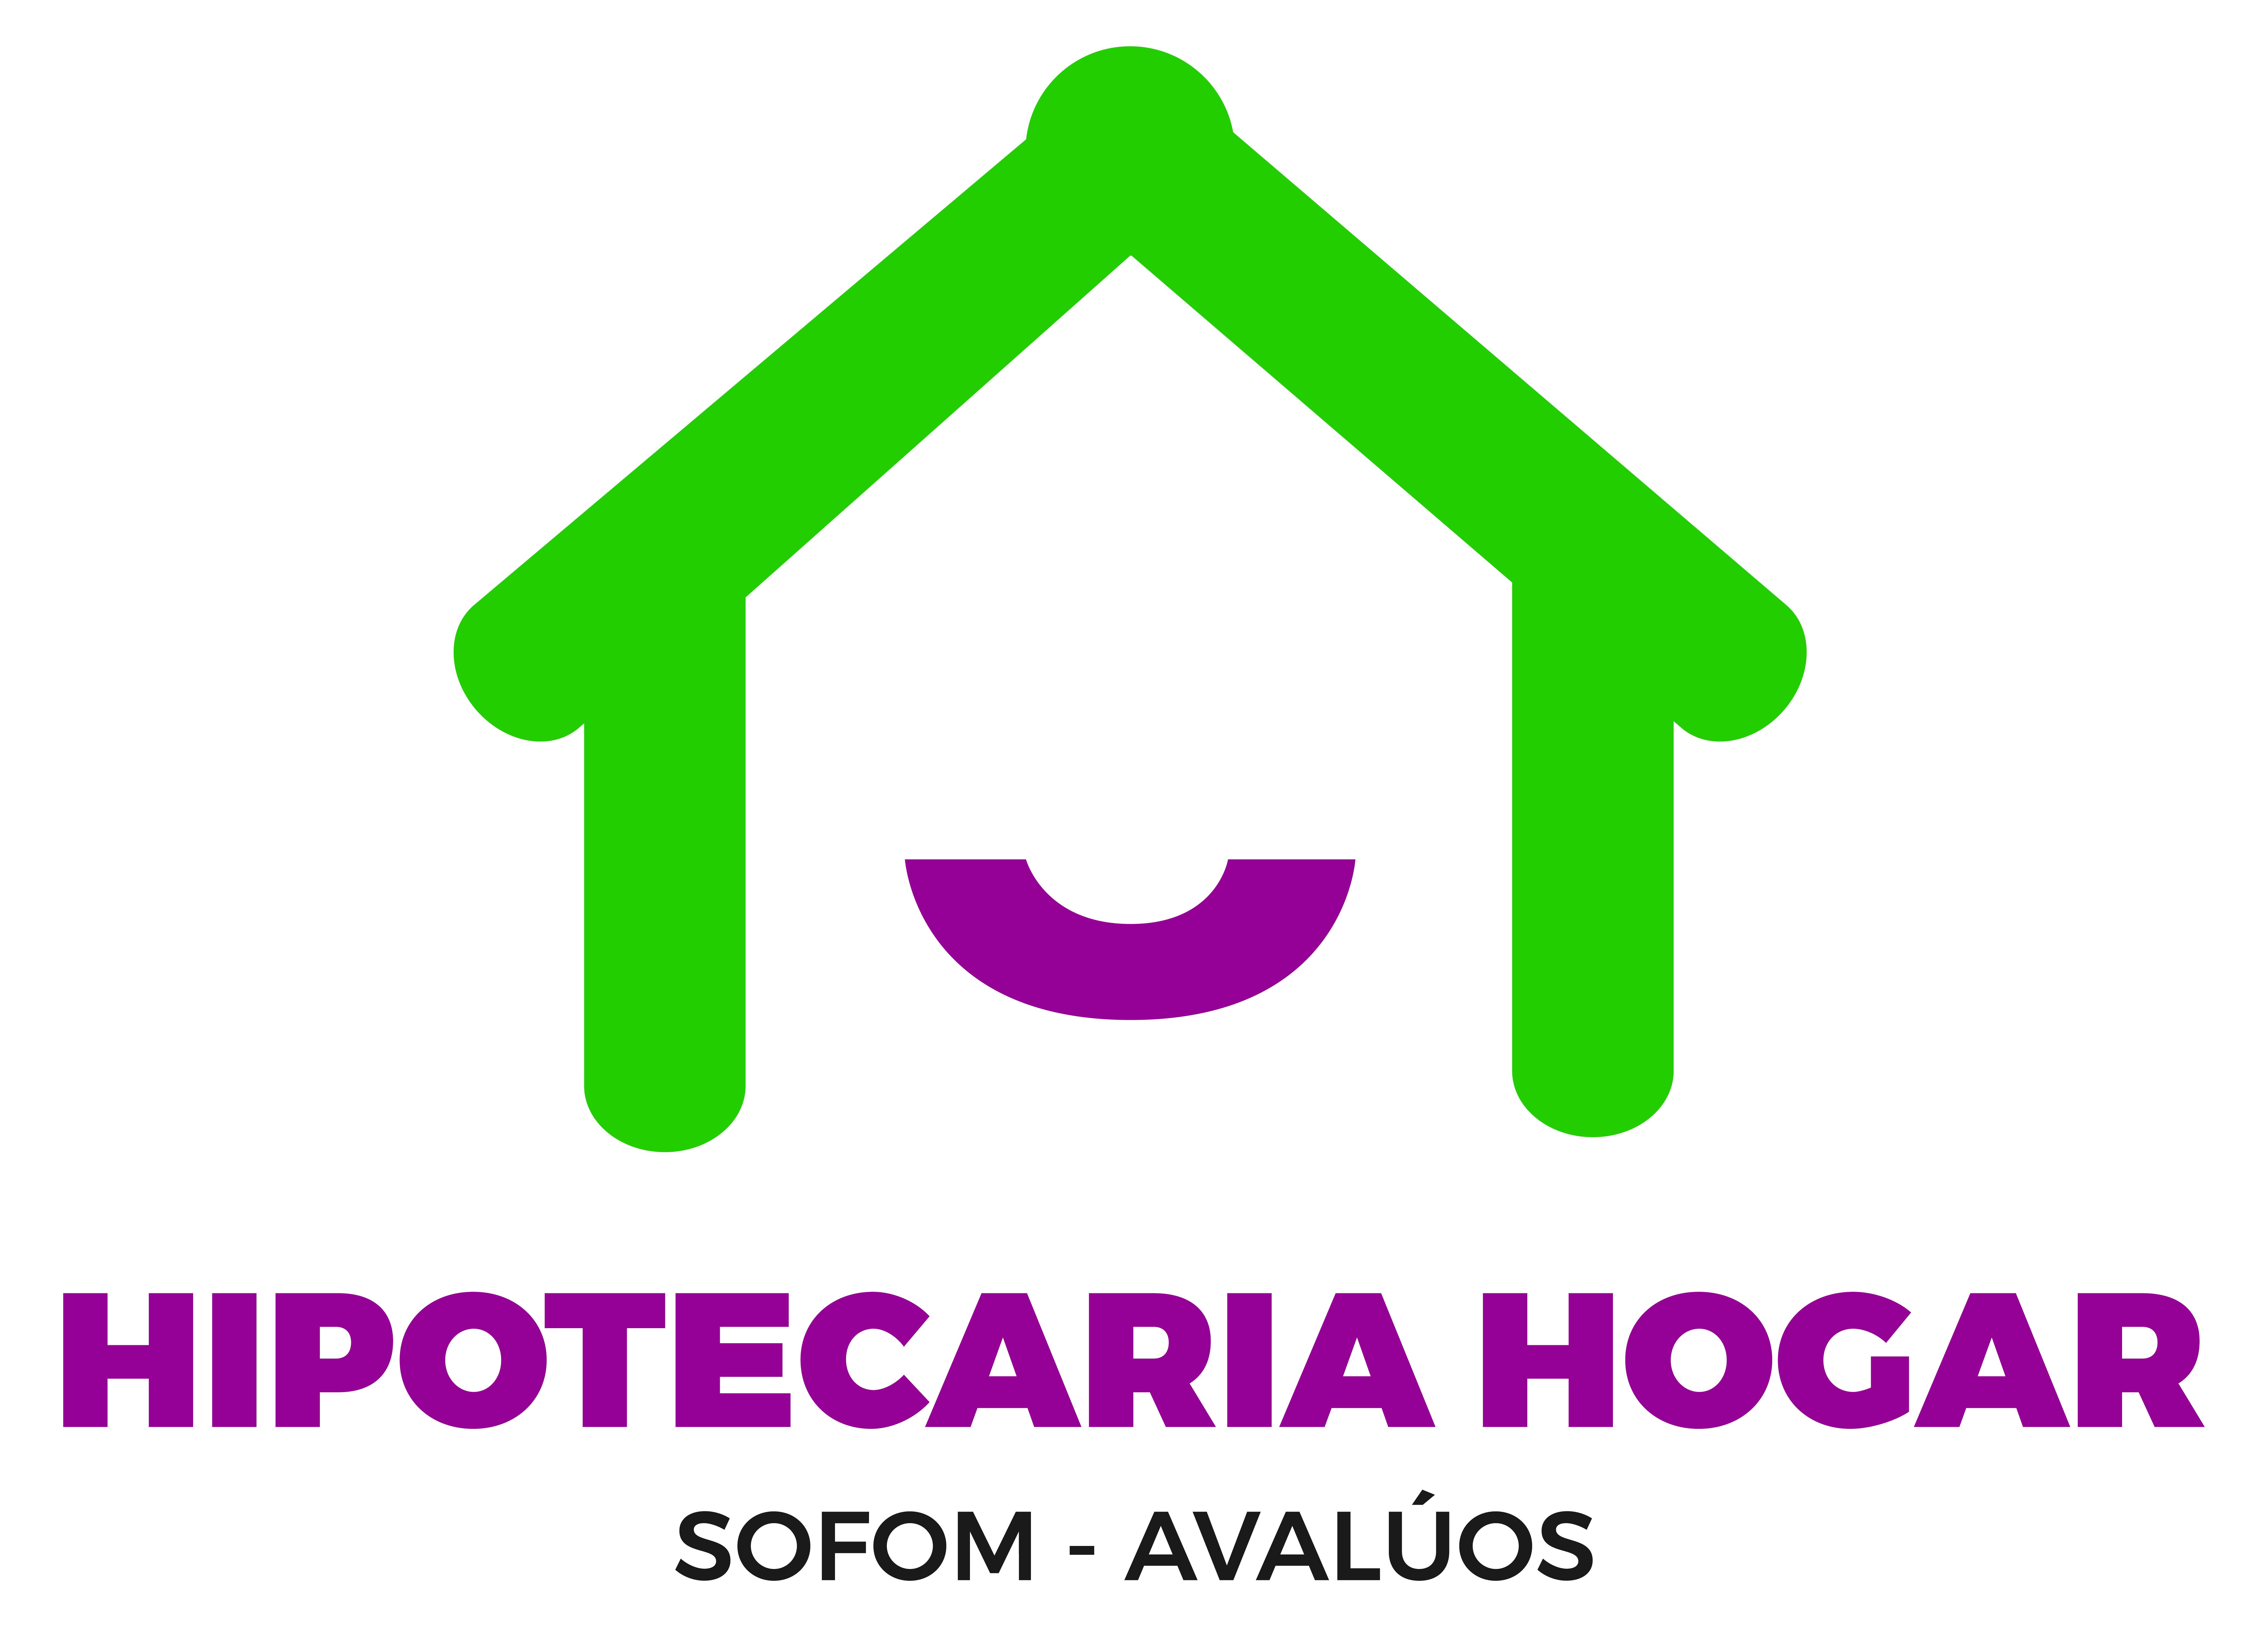 LOGOTIPO_HIPOTECARIA_HOGAR-01.jpg